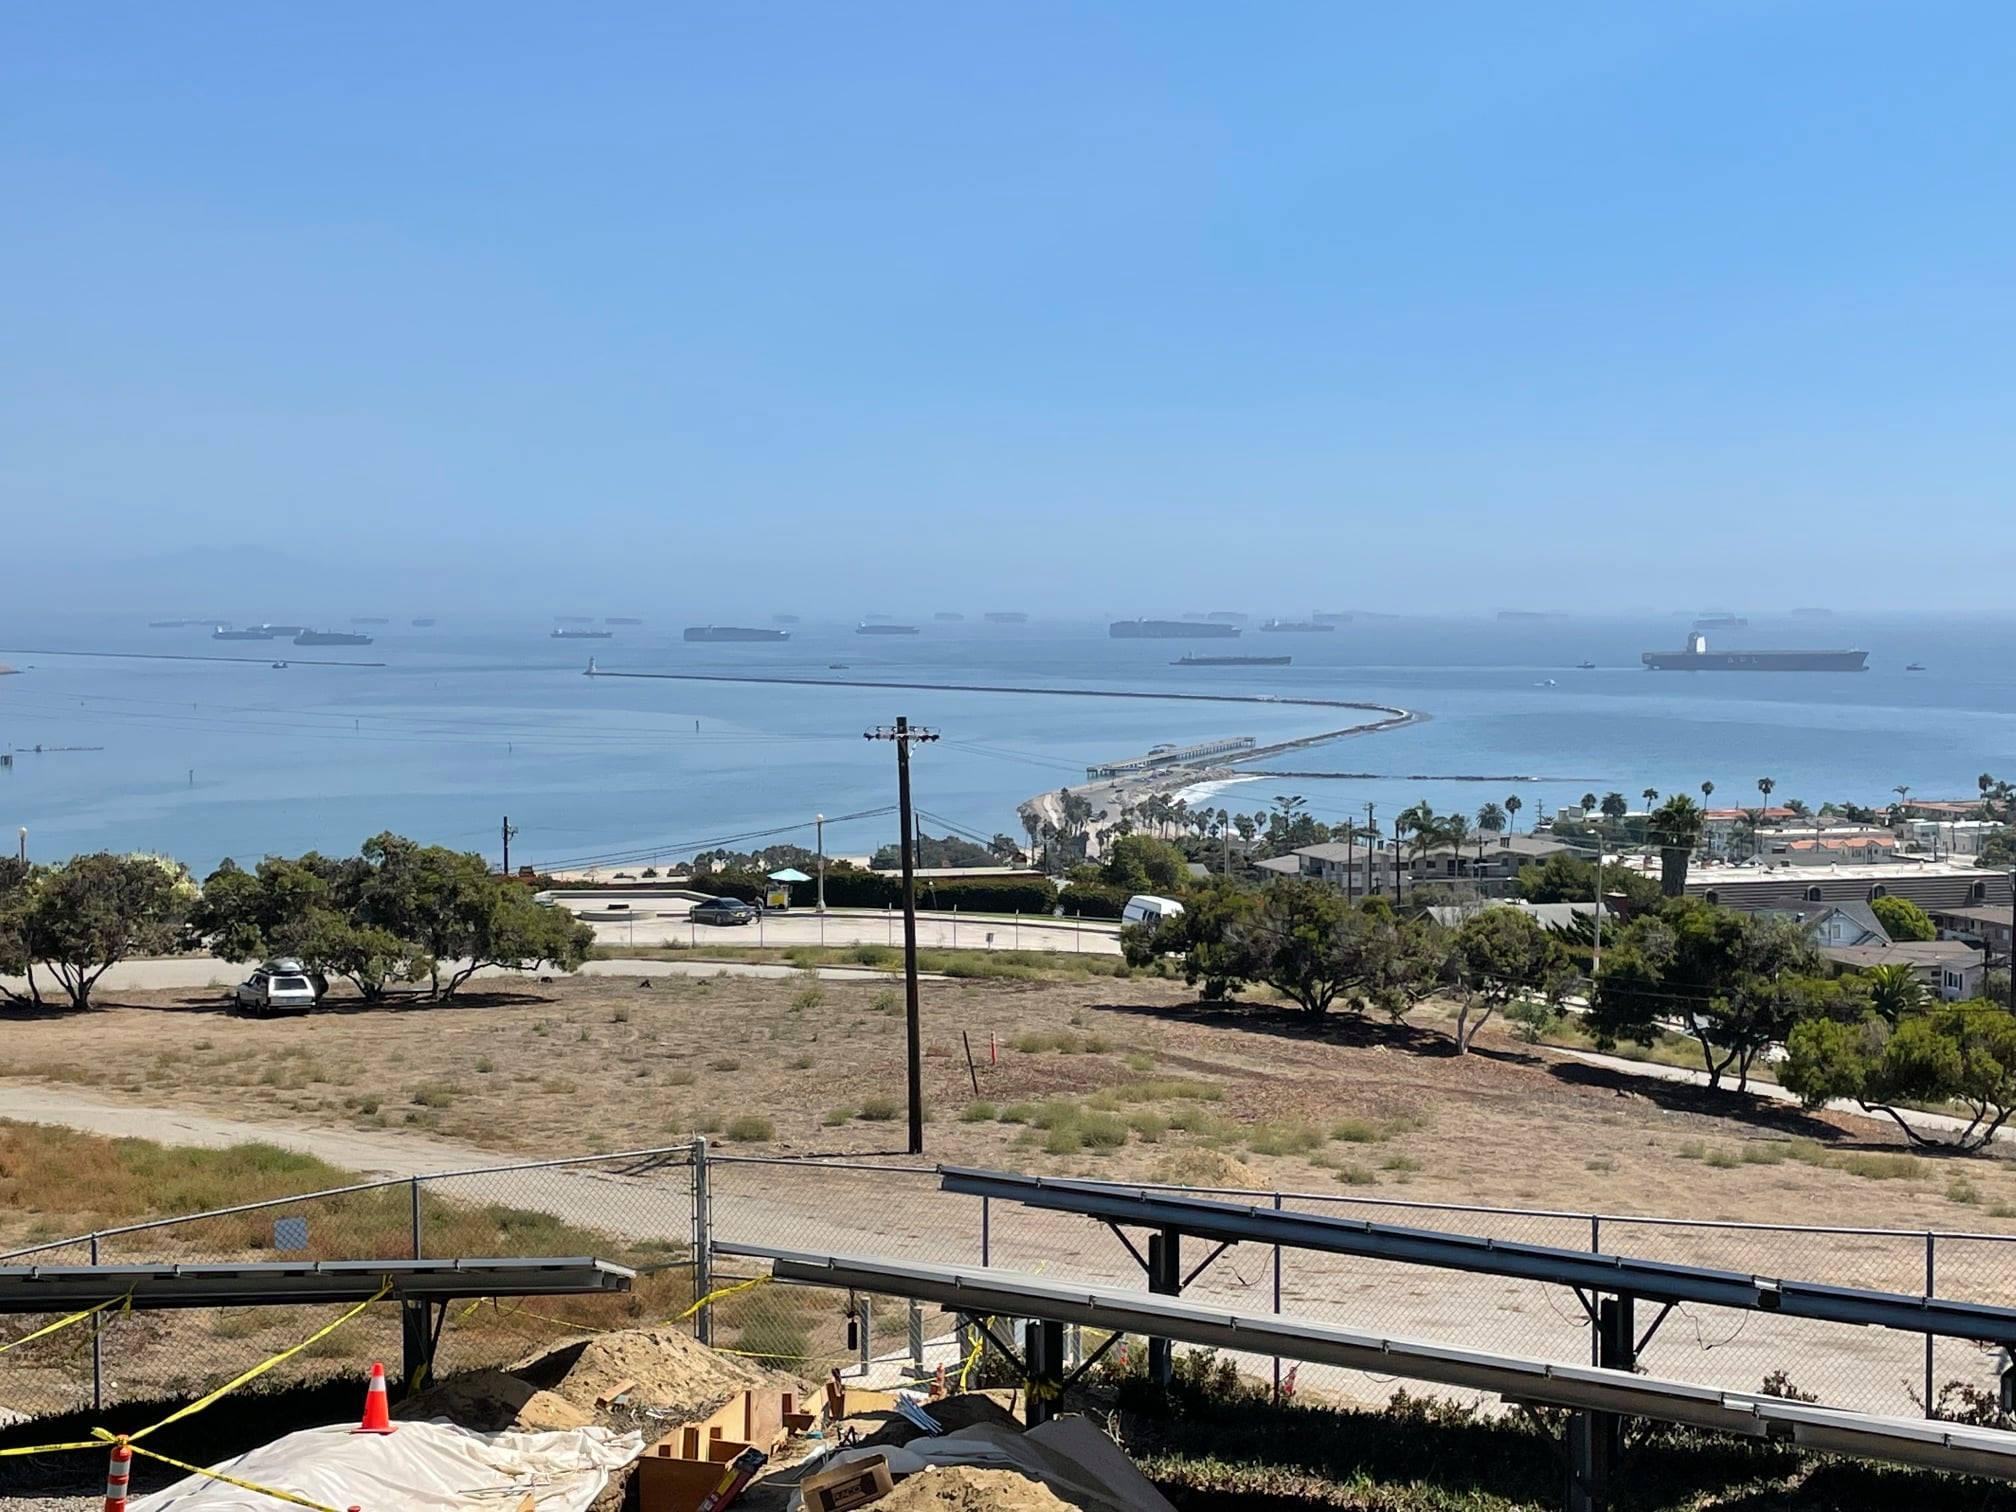 © Marine Exchange of Southern California